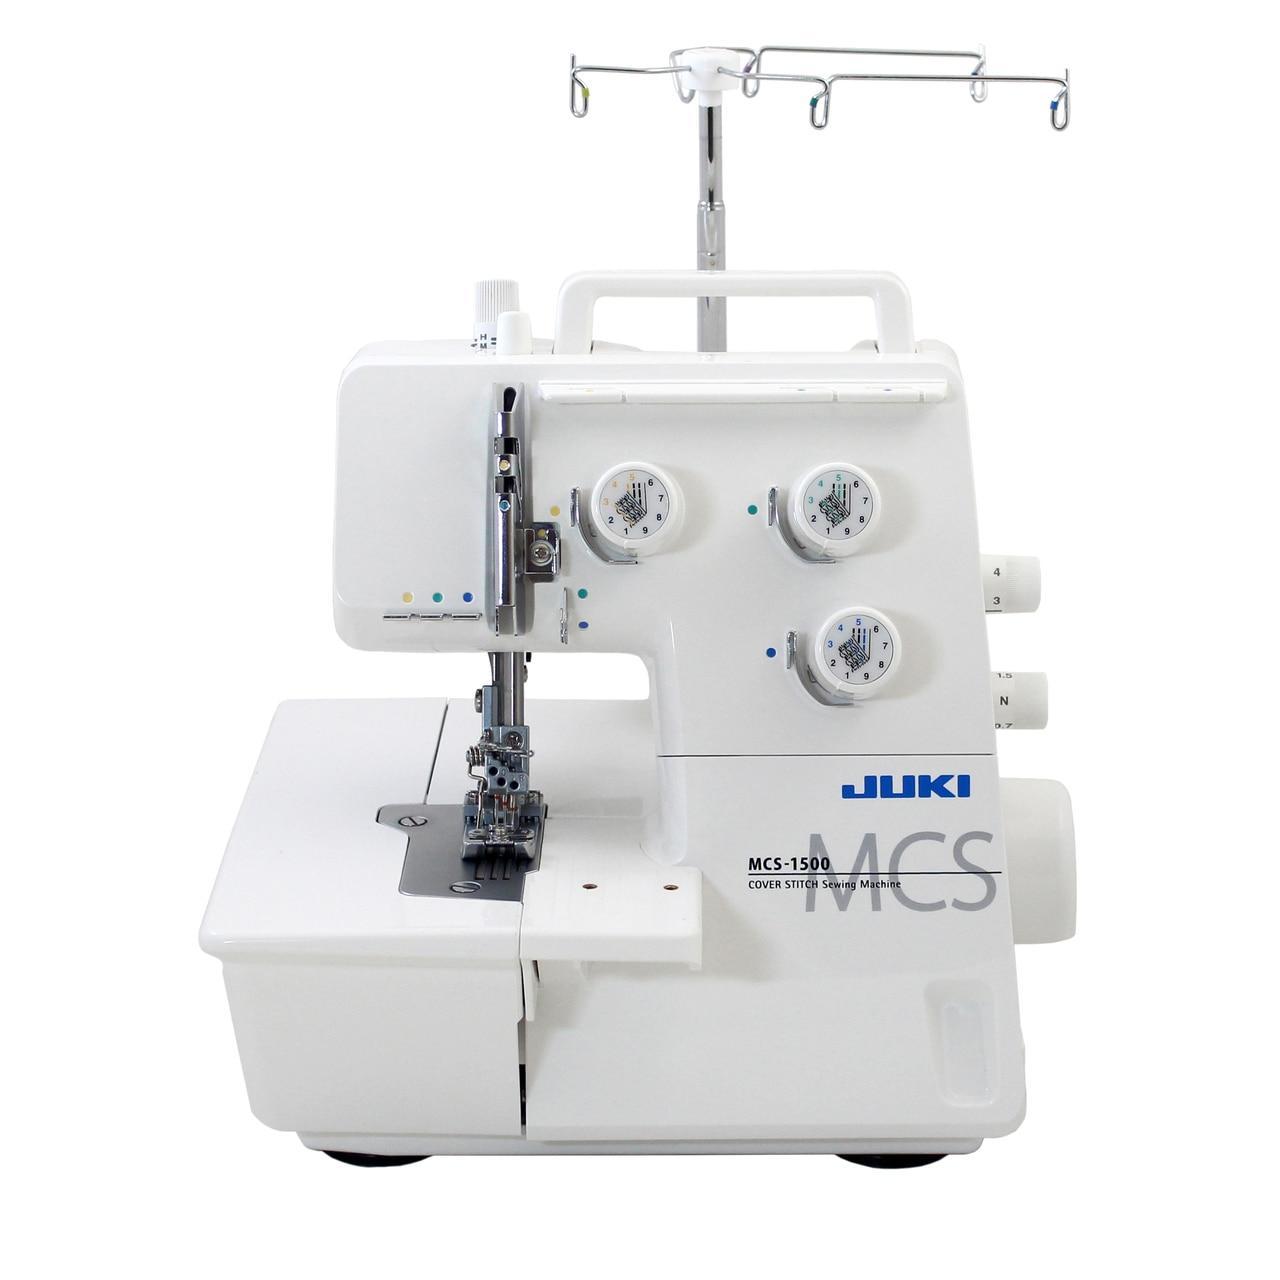 JUKI MCS-1500 COVER & CHAINSTITCH MACHINE